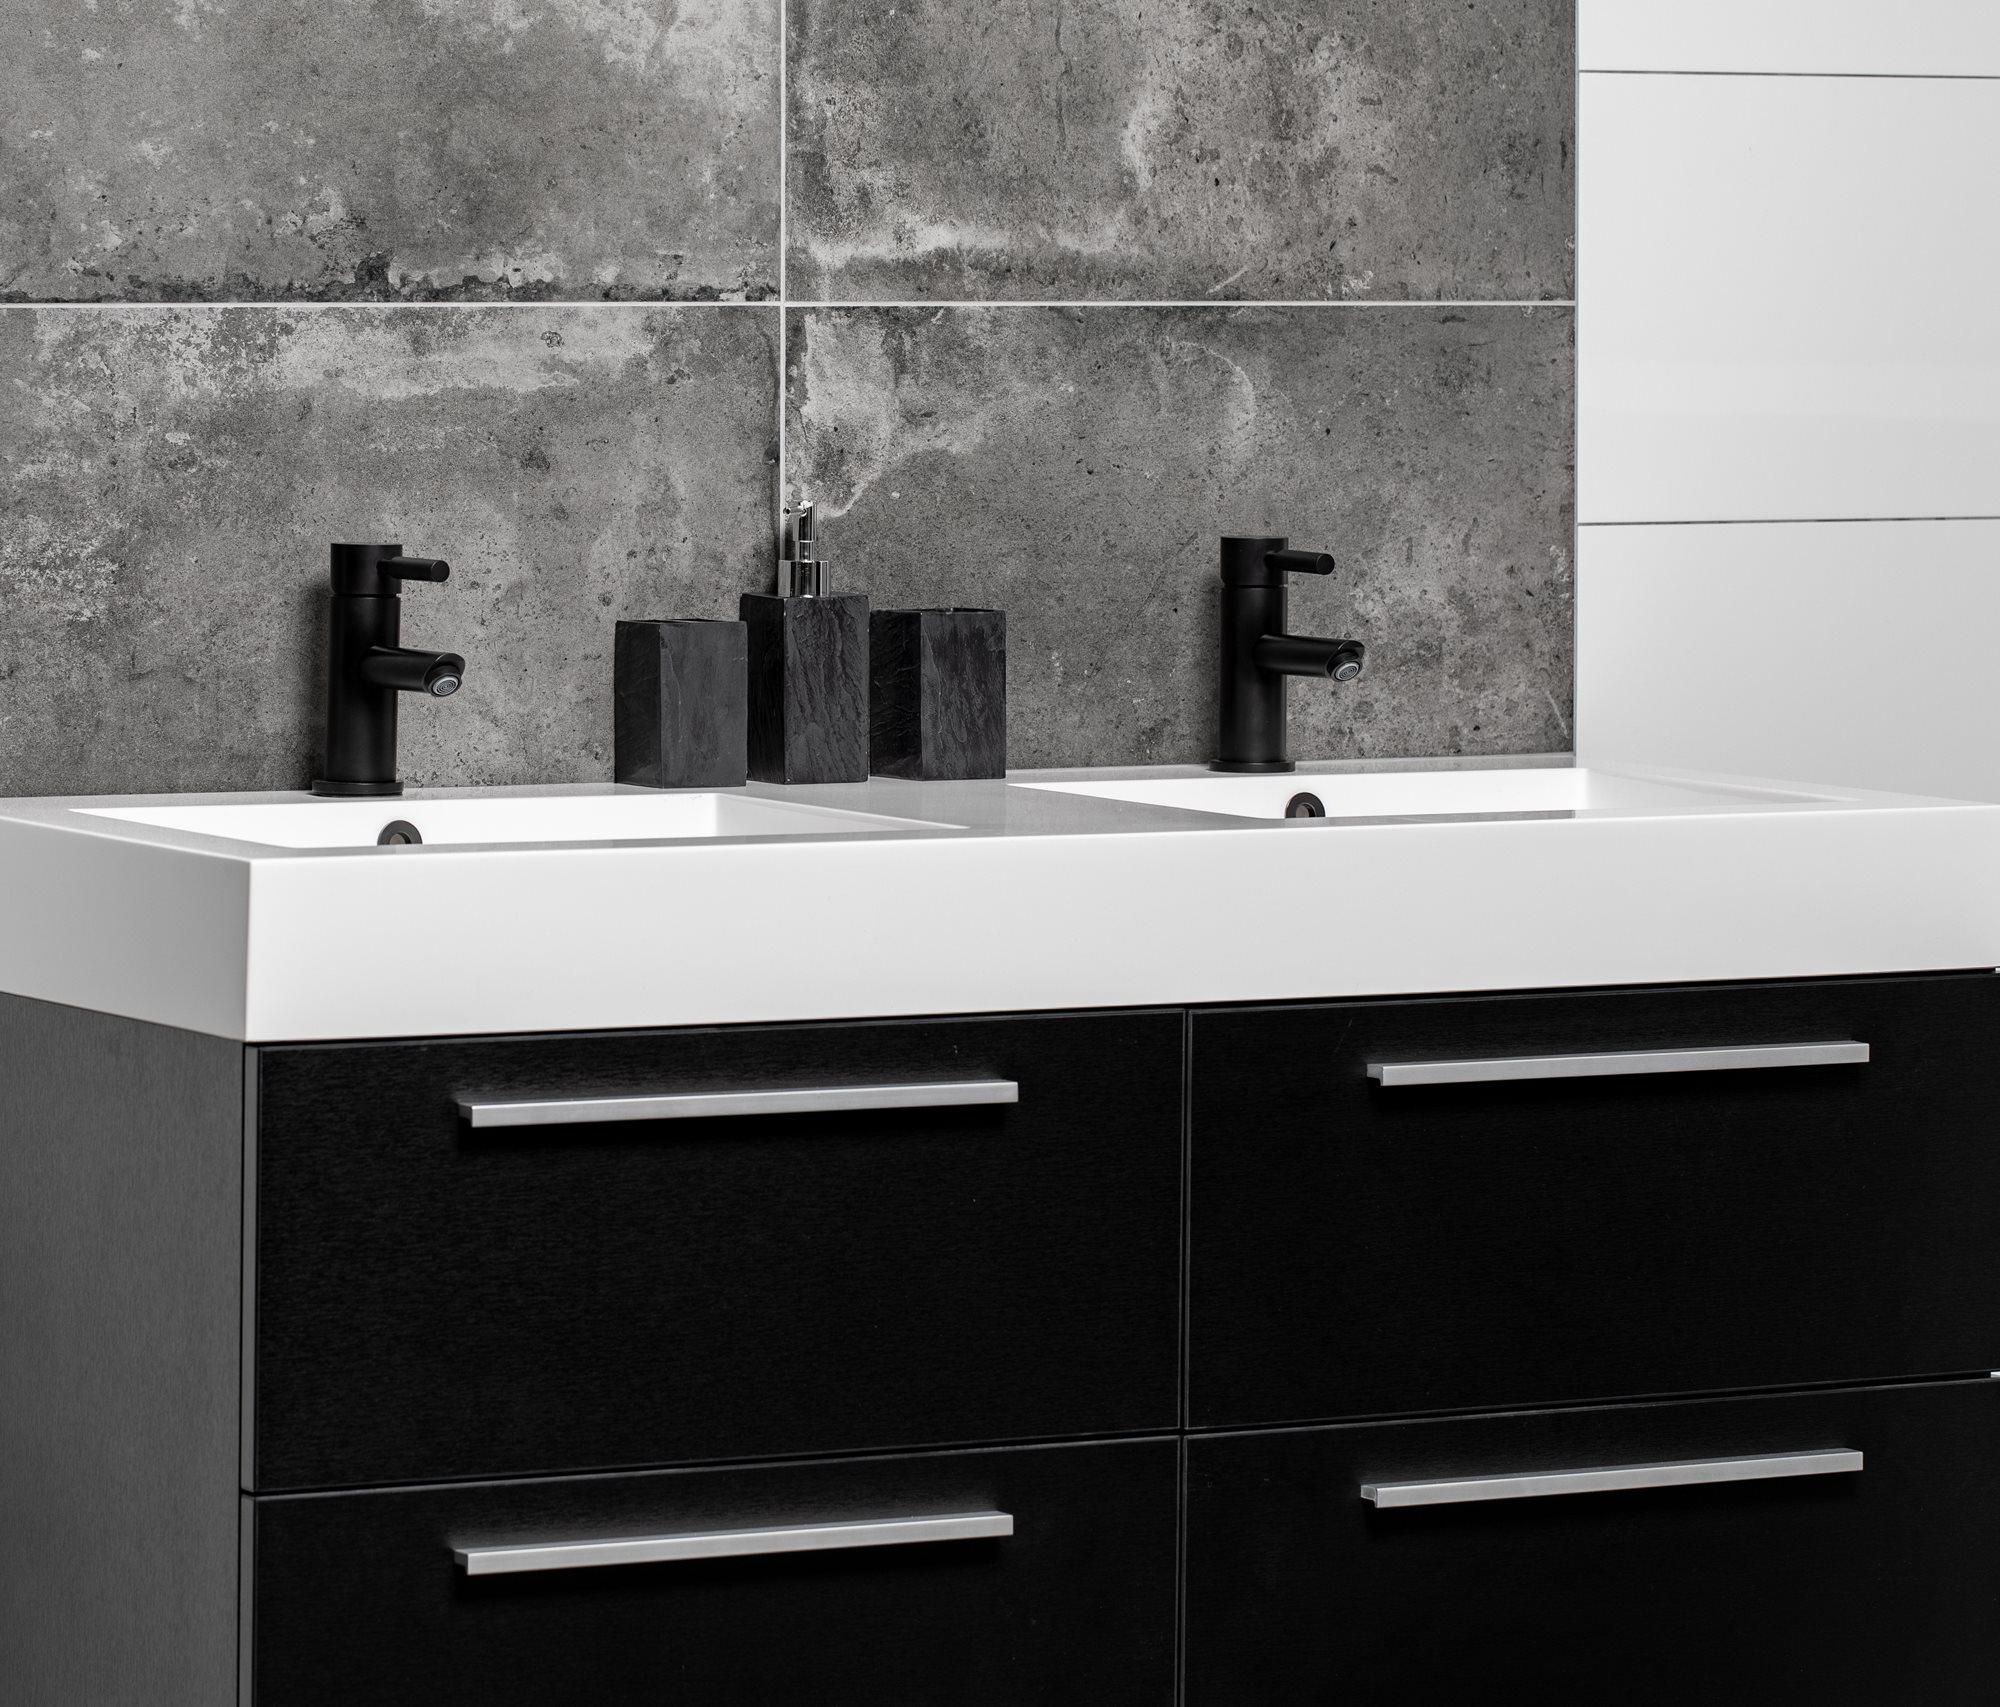 zwart-badkamermeubel-4-lades.jpg